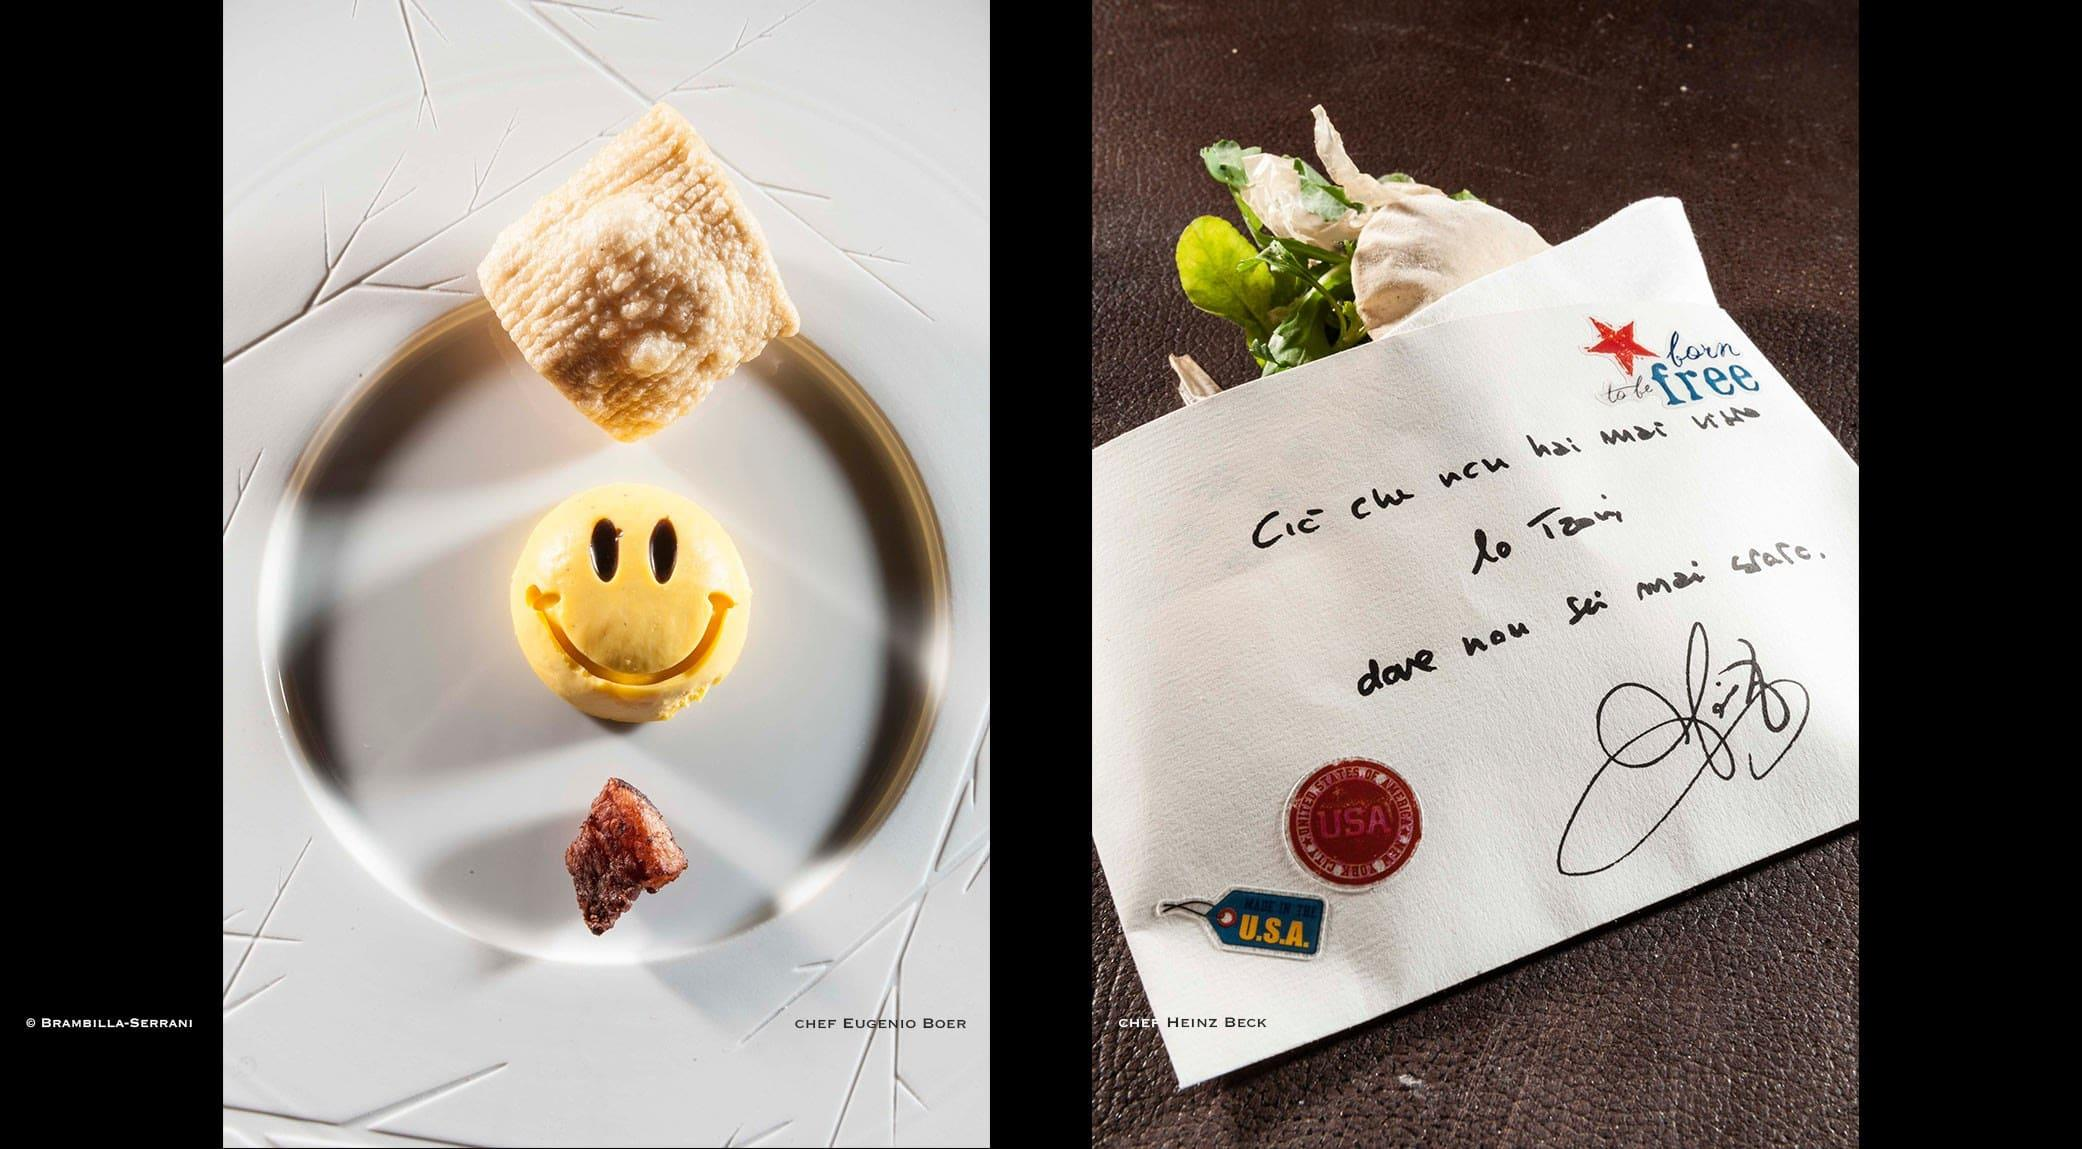 original_10-Eugenio-Boer-Heinz-Beck-dish.jpg